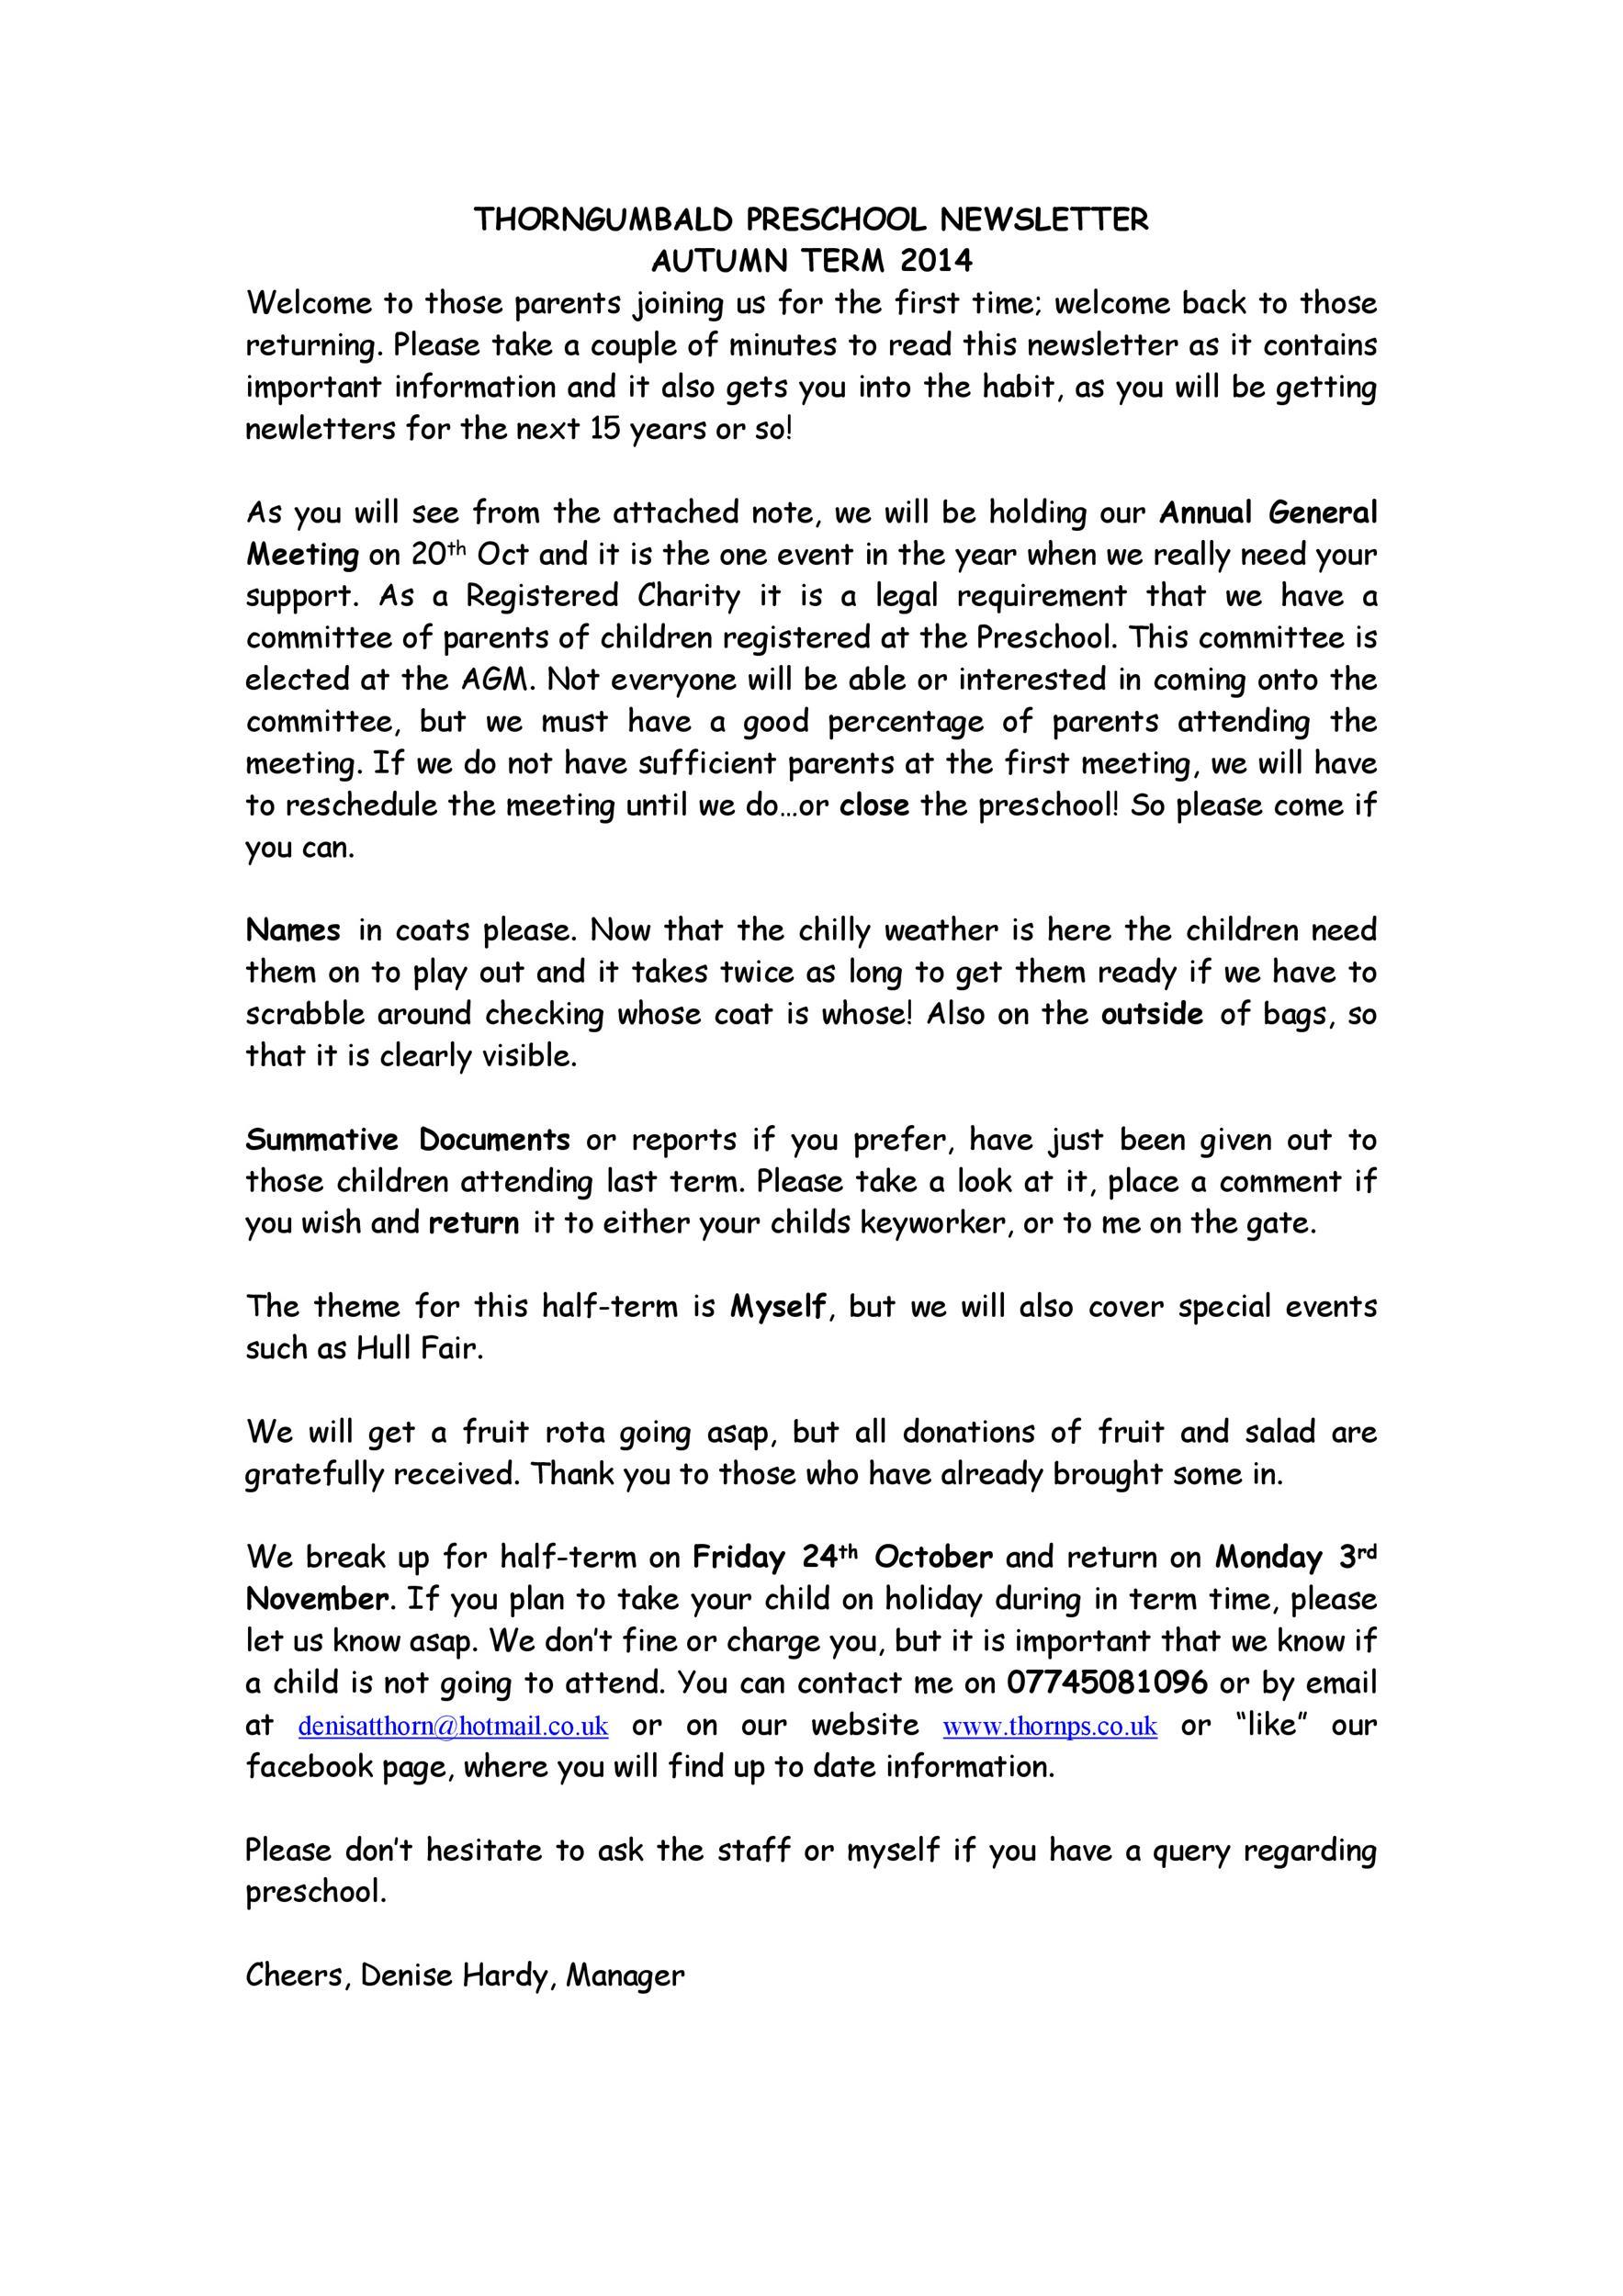 Free preschool newsletter template 47